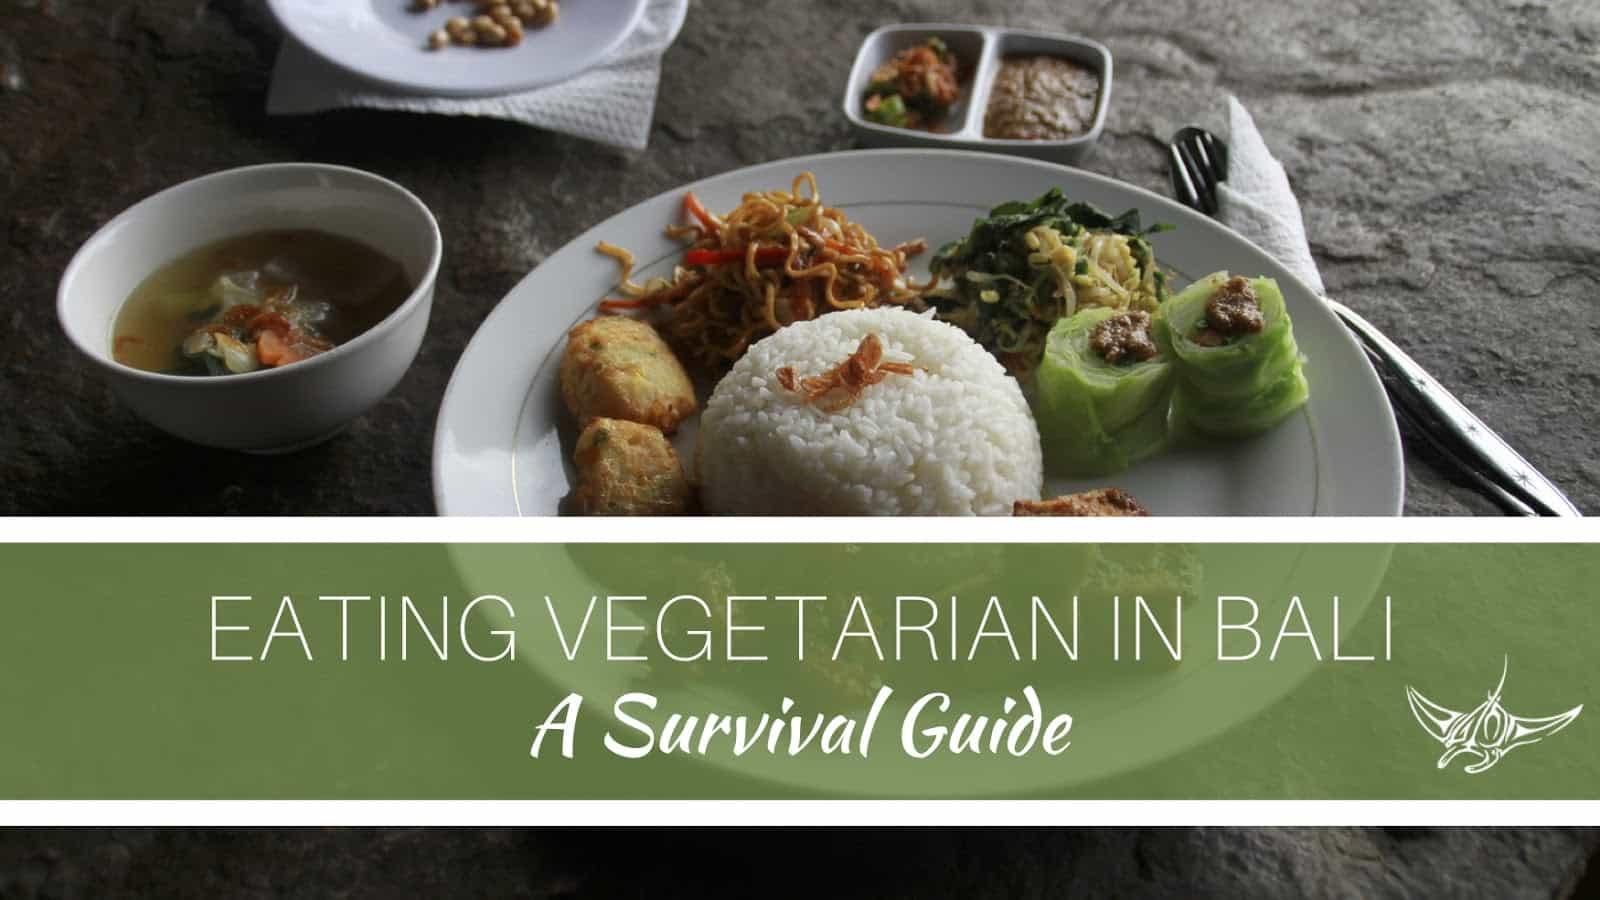 Eating Vegetarian in Bali